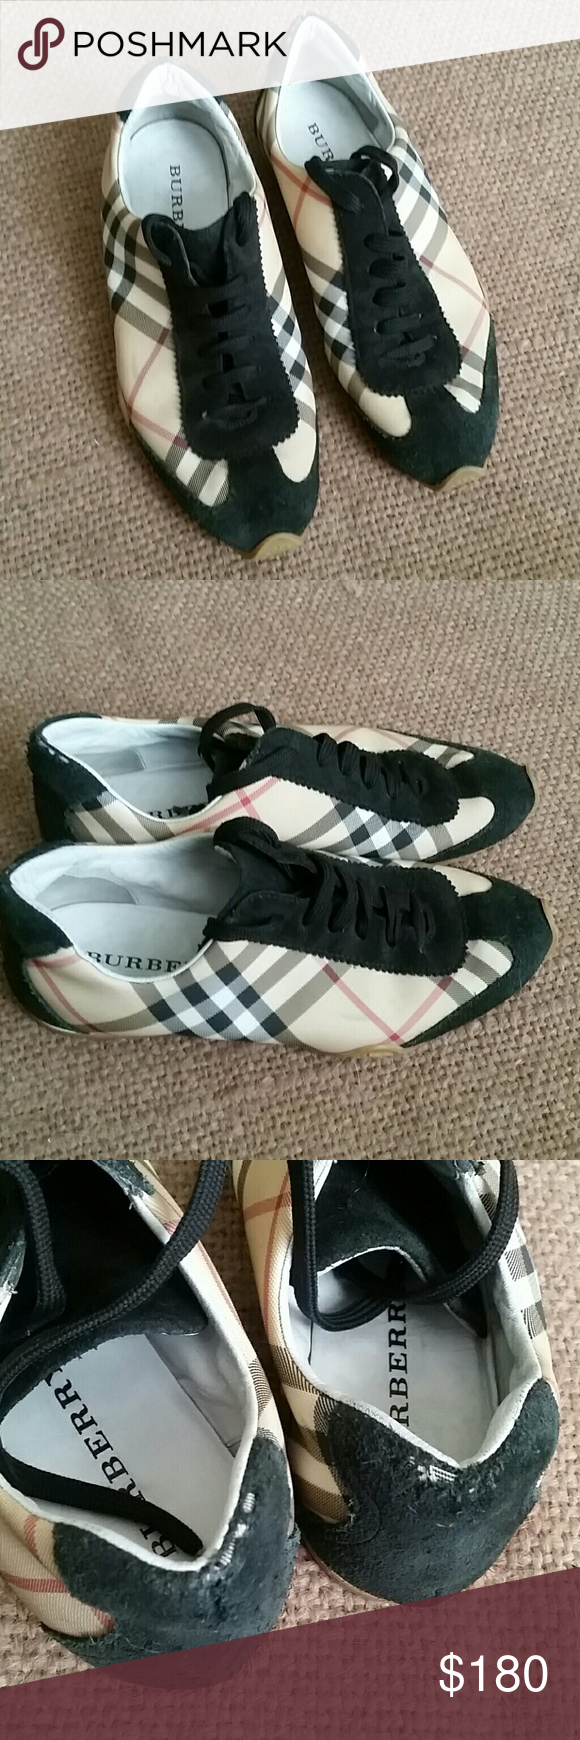 Burberry scarpe da ginnastica   My Posh  Picks   Pinterest  Posh  Burberry scarpe   ee2cc2